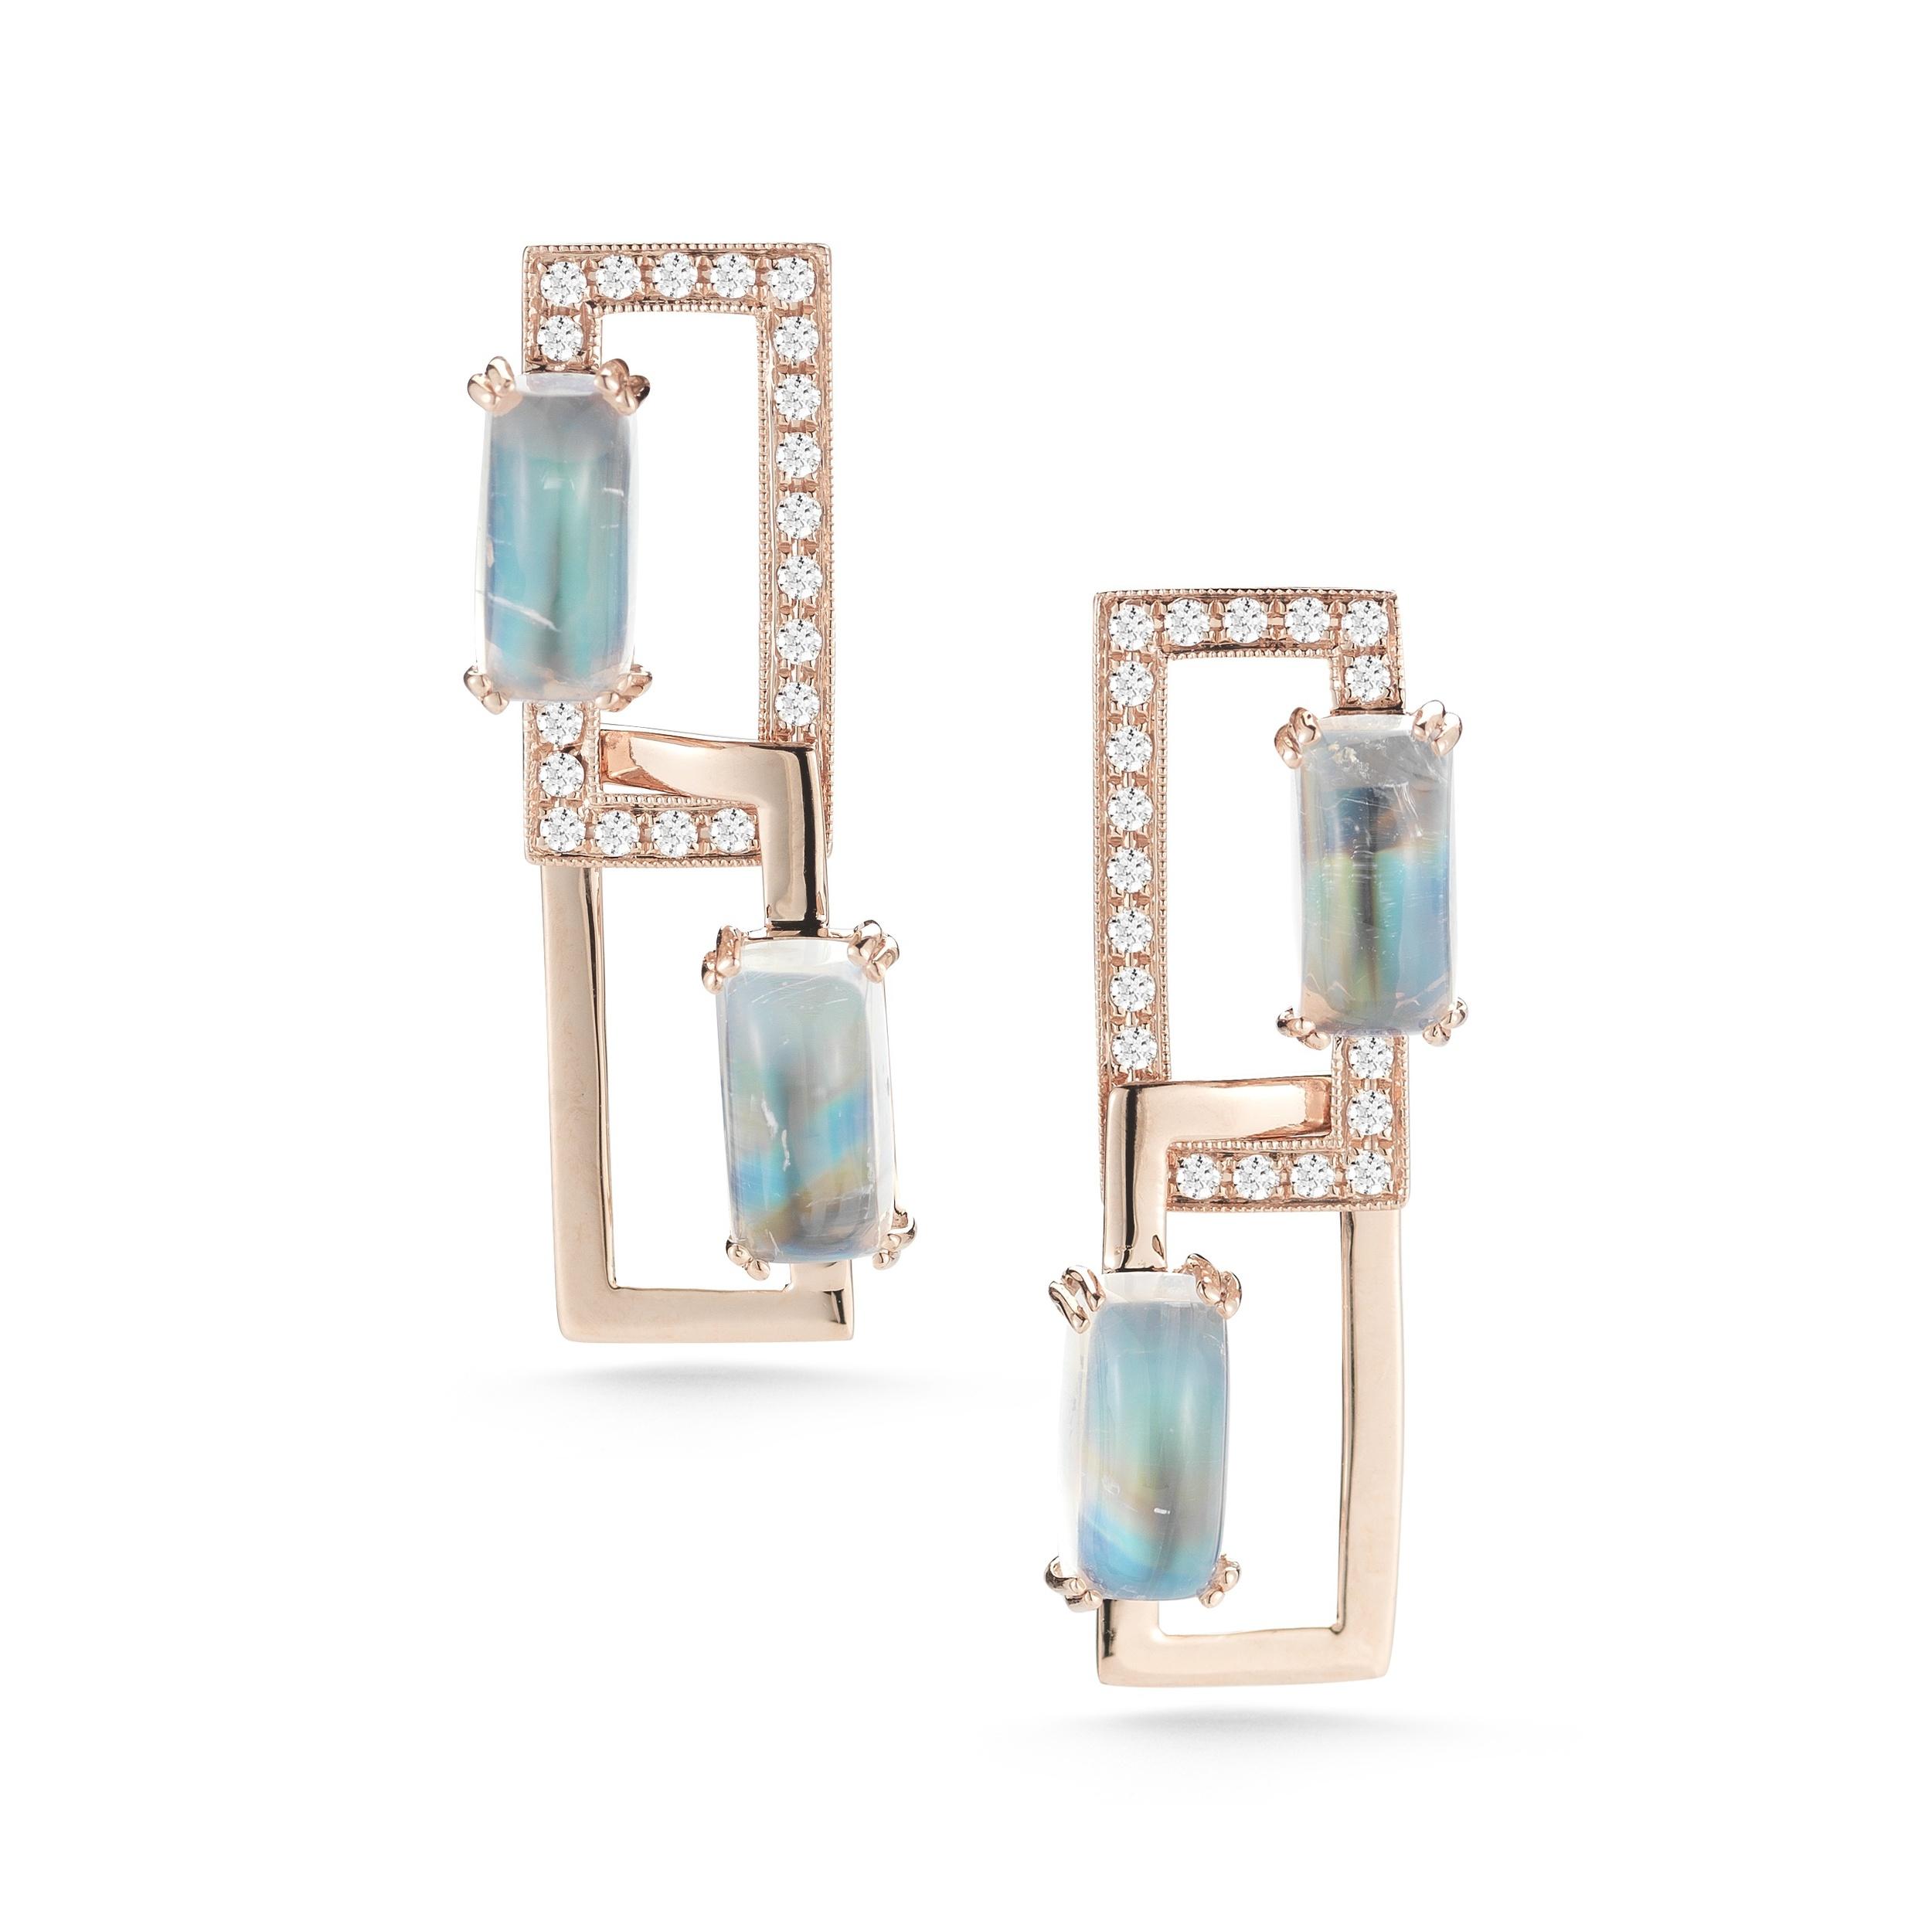 Moonstone earrings, $2,420, available soon!